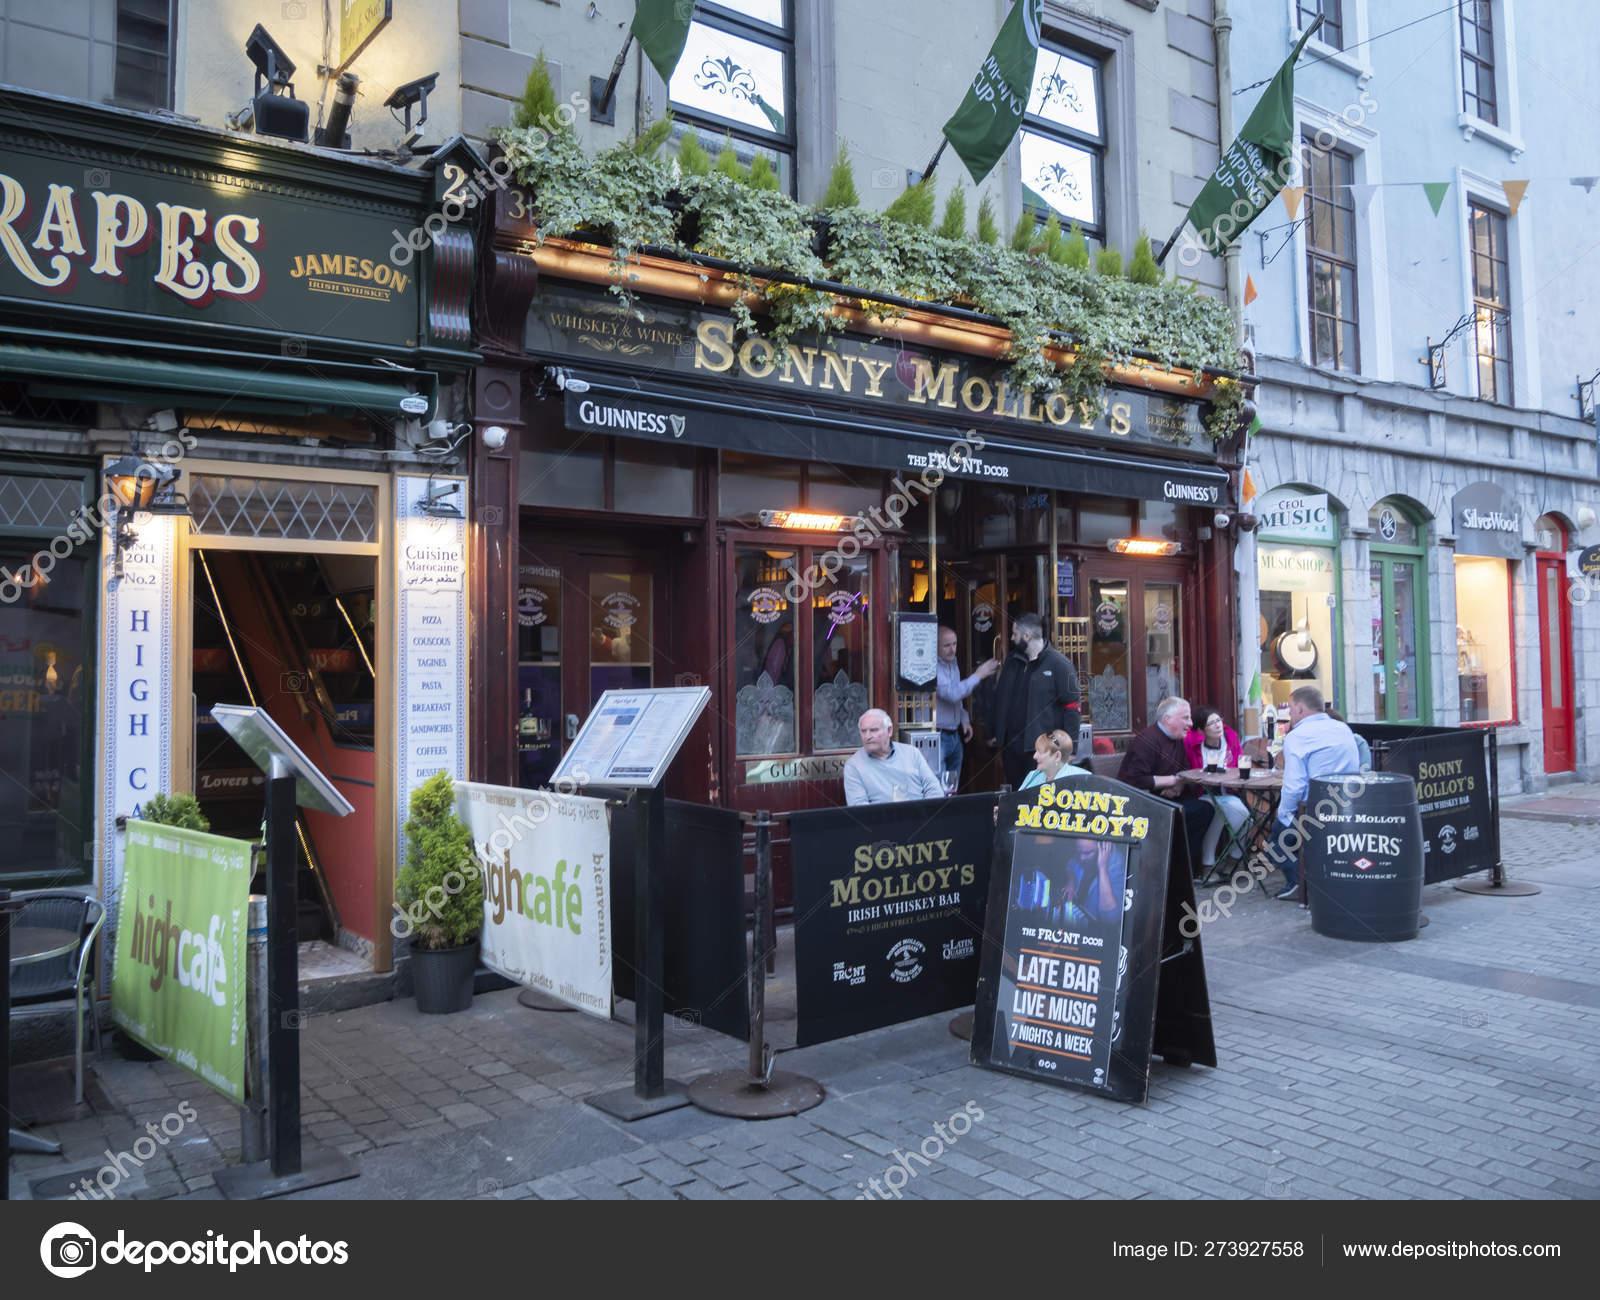 Pubs Restaurants Galway Ireland Galway Claddagh Ireland May